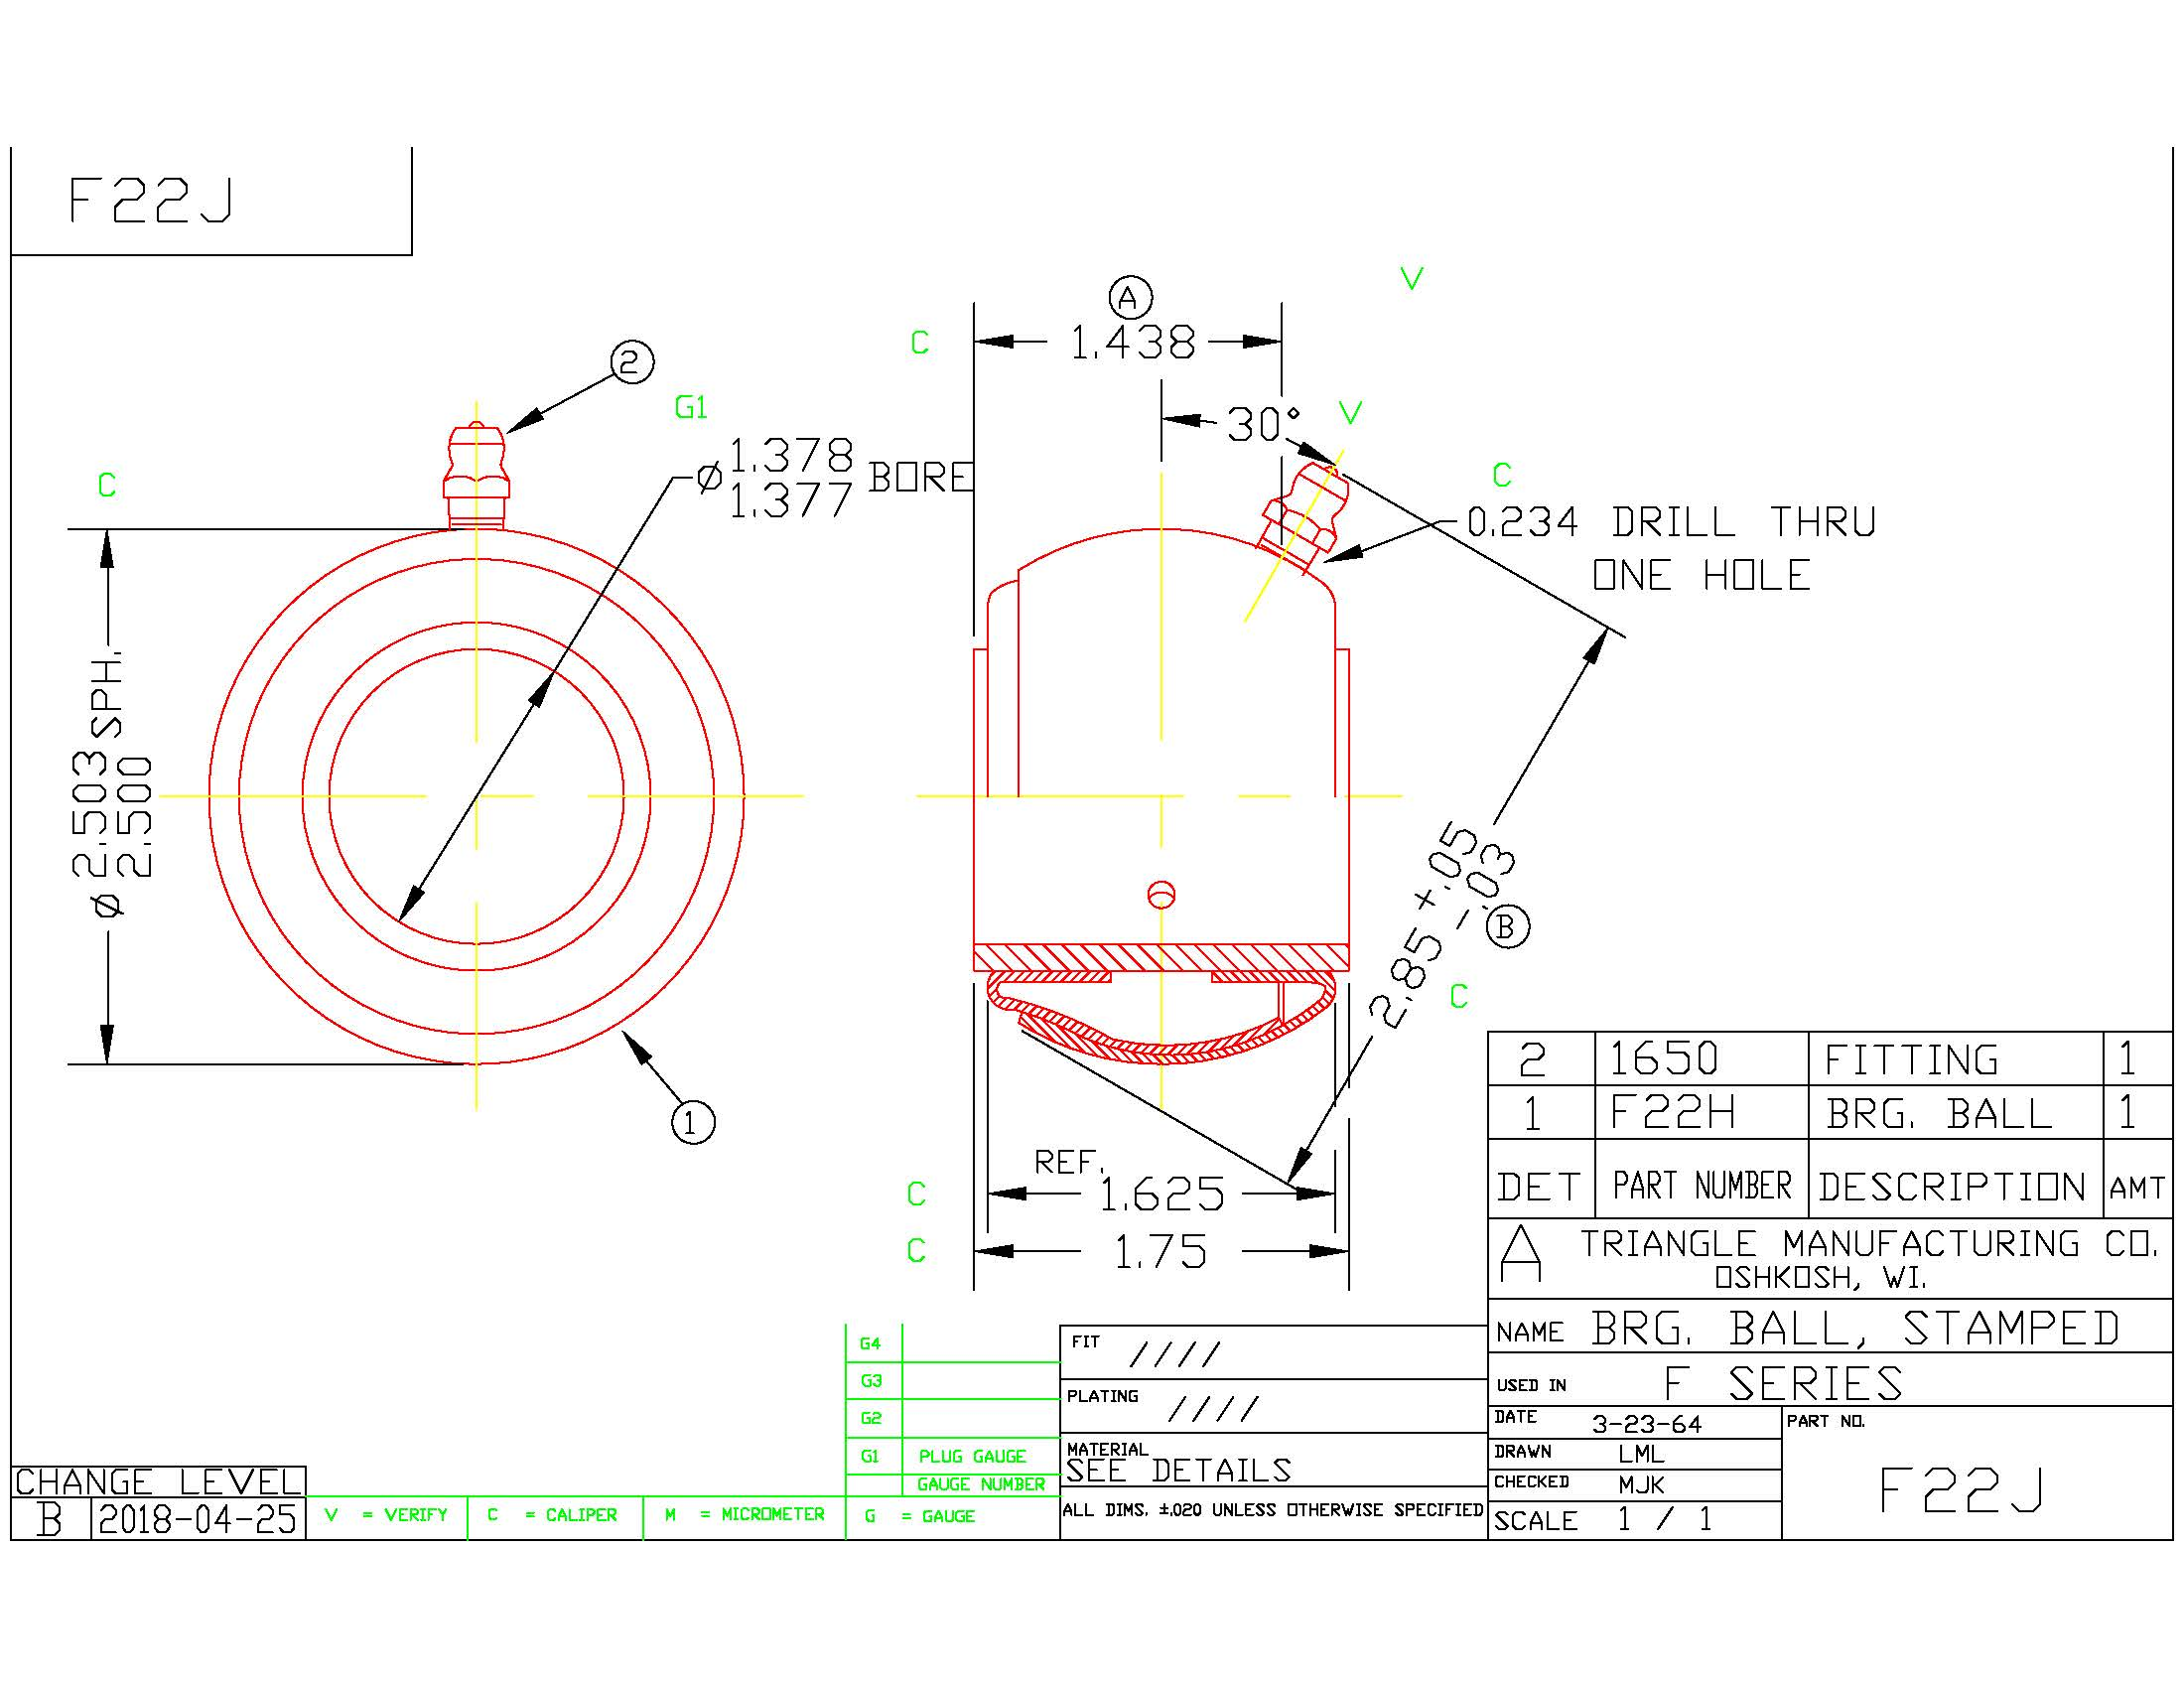 Spherical Plain Bearing F22J